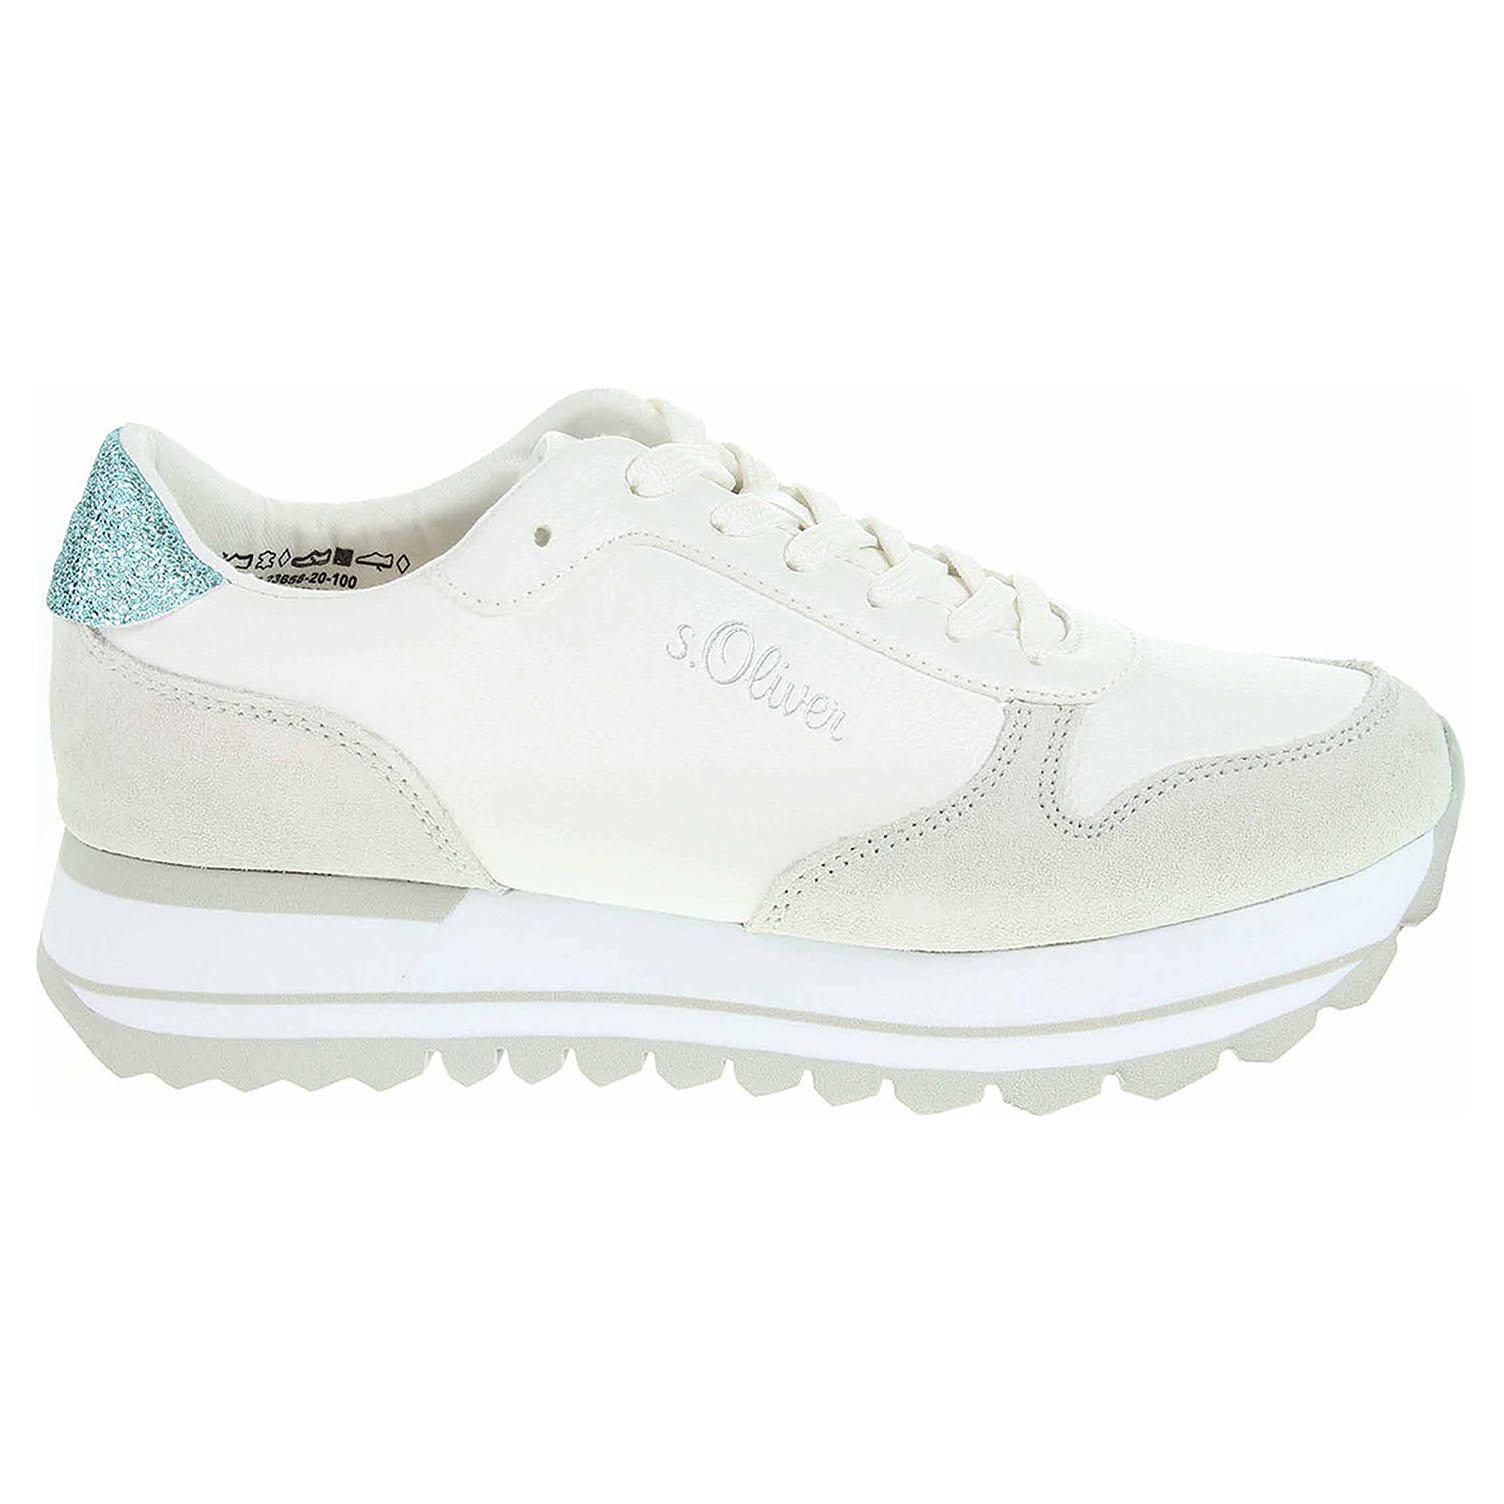 Oliver dámská obuv 5-23658-20 white 5-5-23658 cb192a3c20